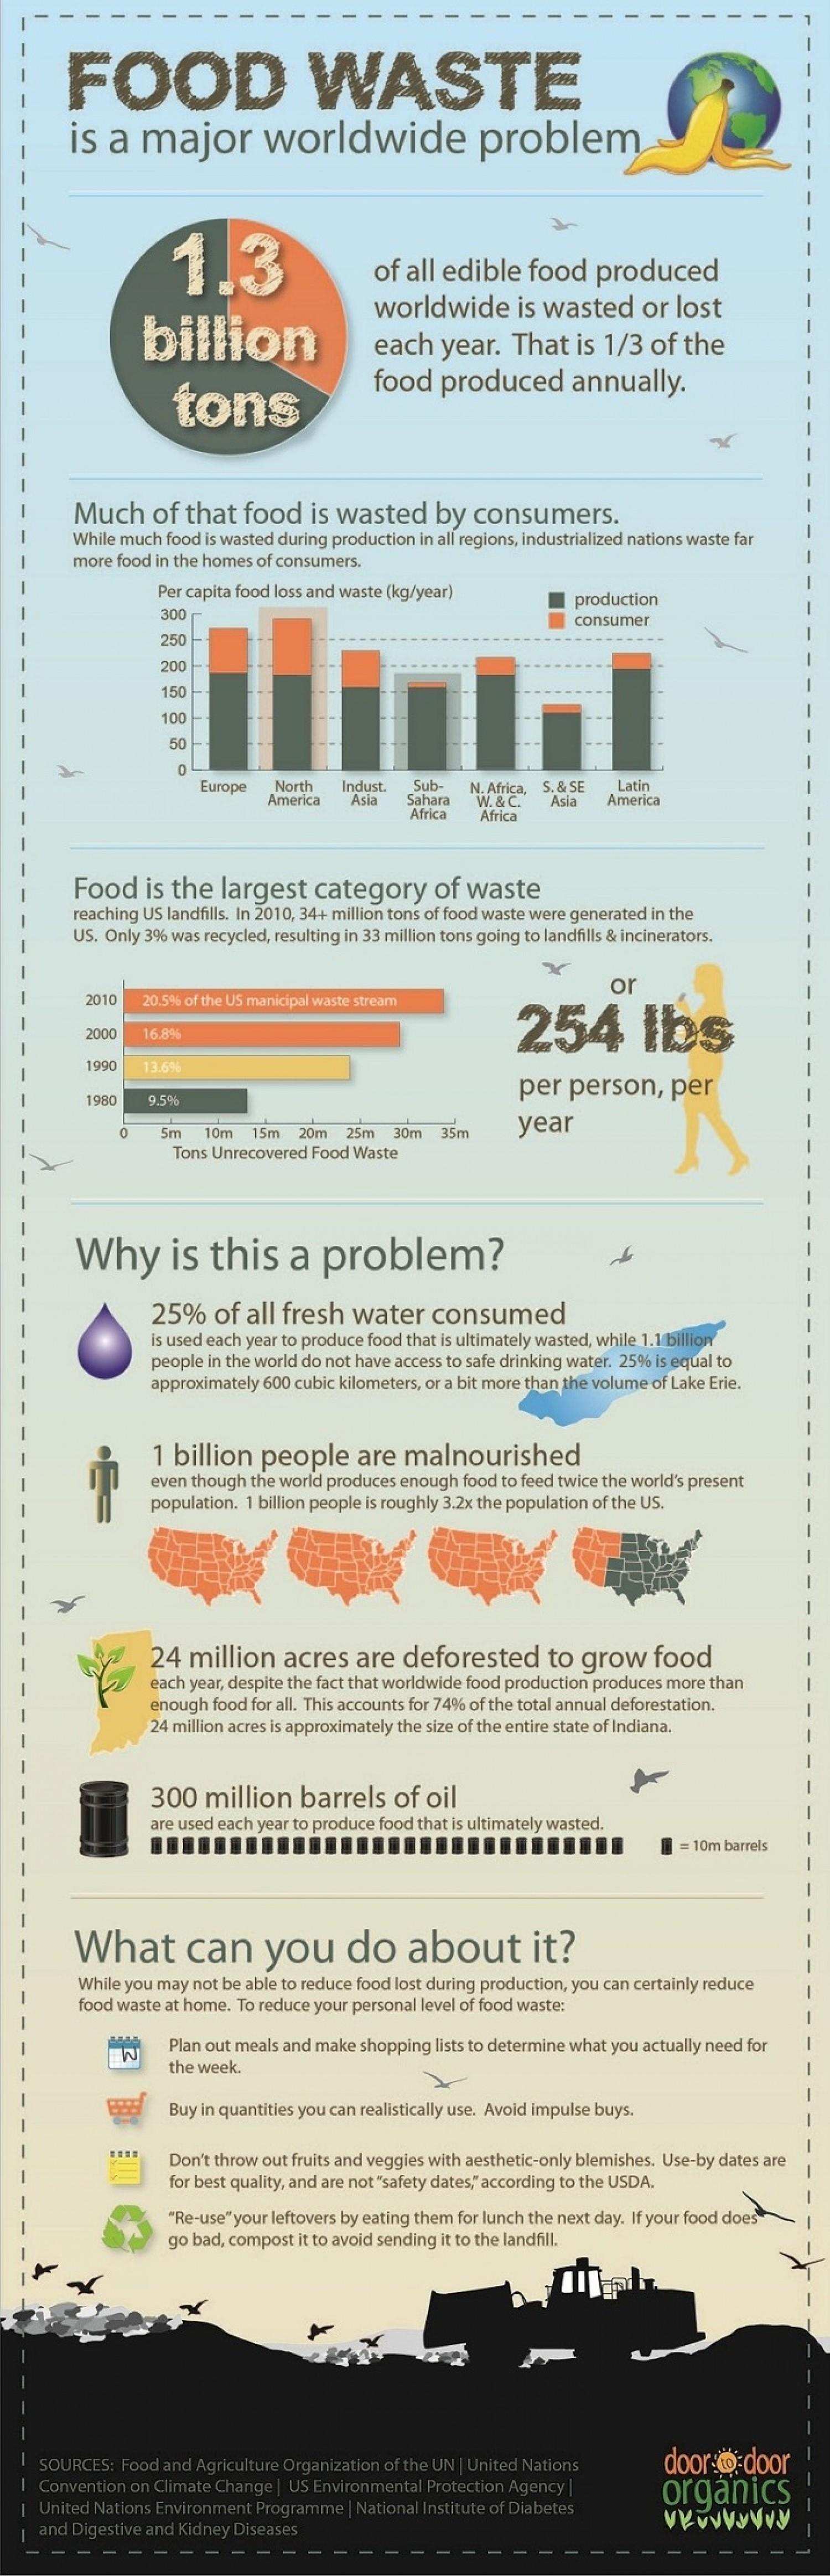 Food Waste | Visual.ly